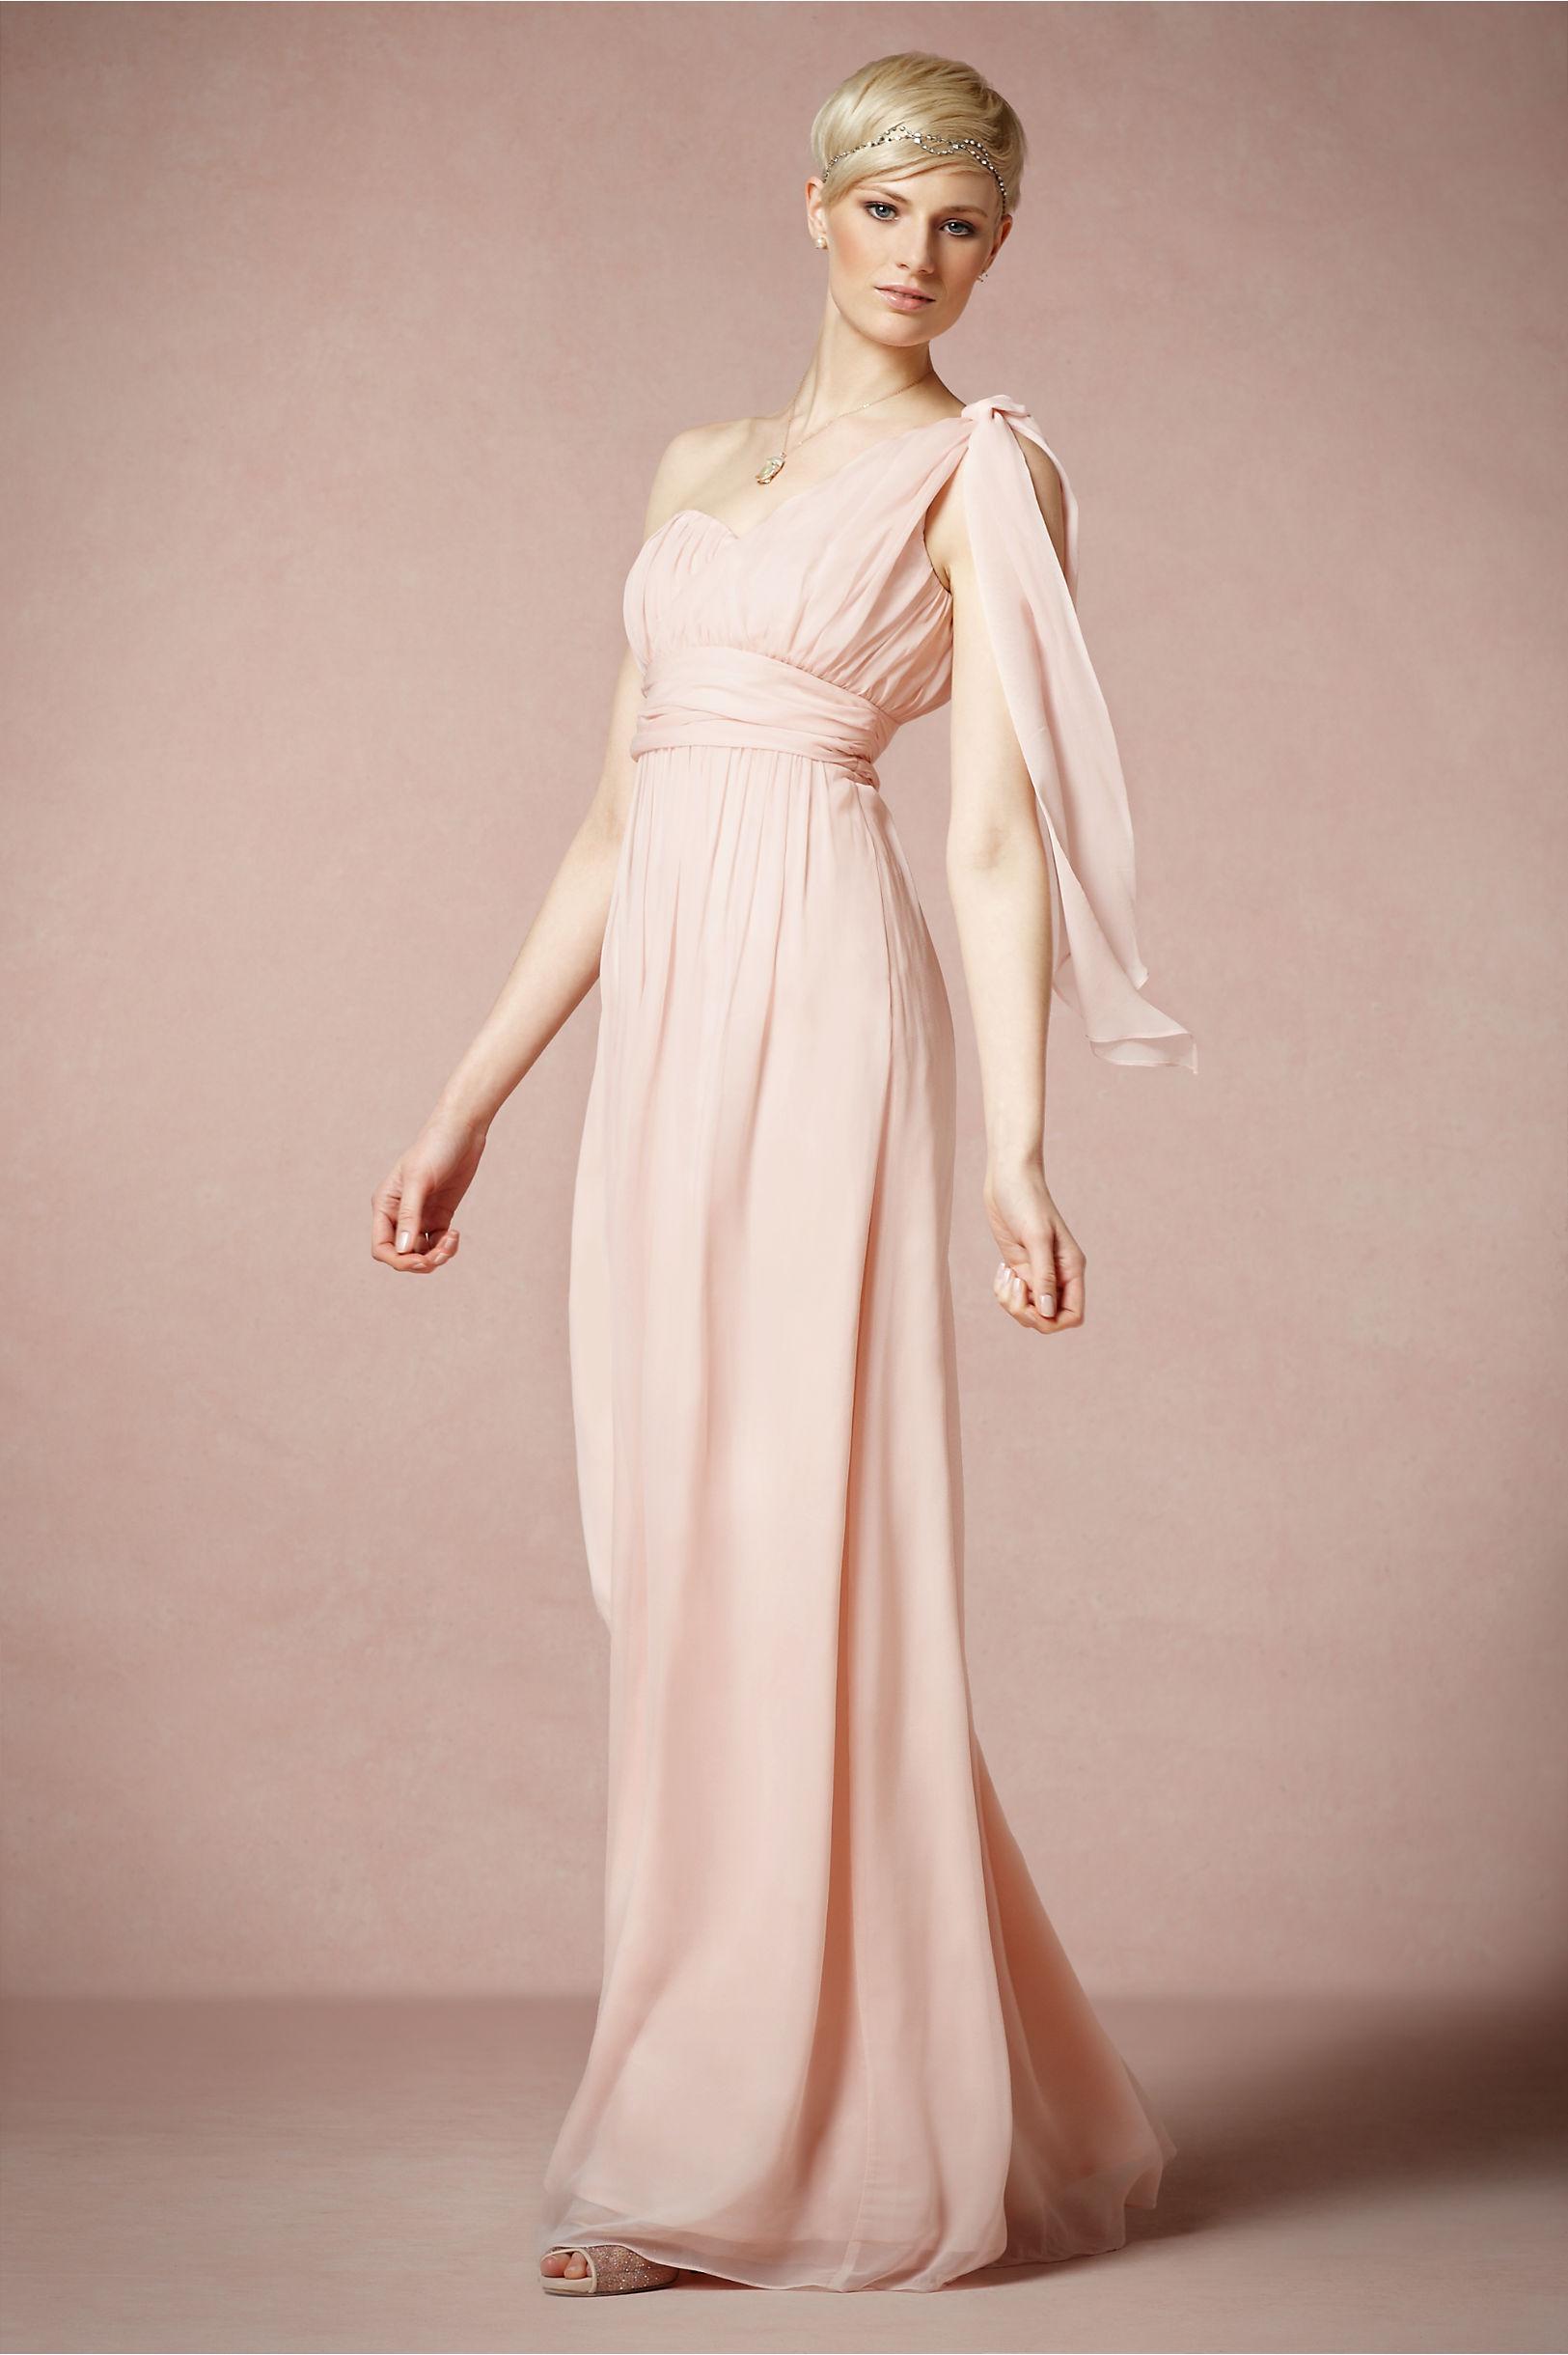 Vistoso Grecian Party Dress Ideas - Colección de Vestidos de Boda ...